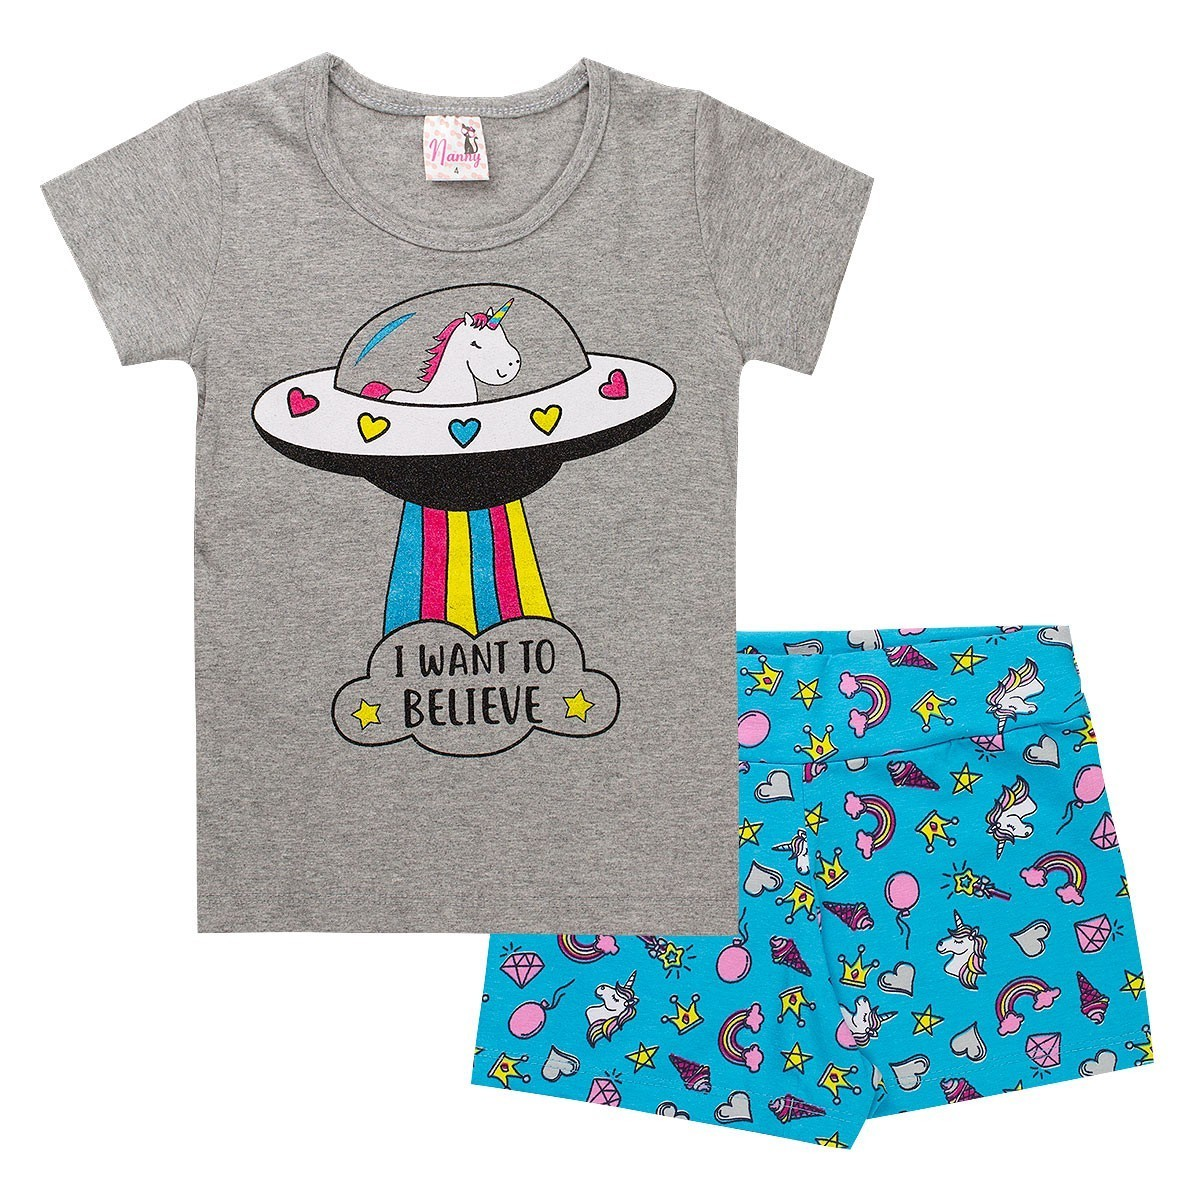 Kit 5 Conjuntos Infantis Menina Estampas e Cores Sortidas